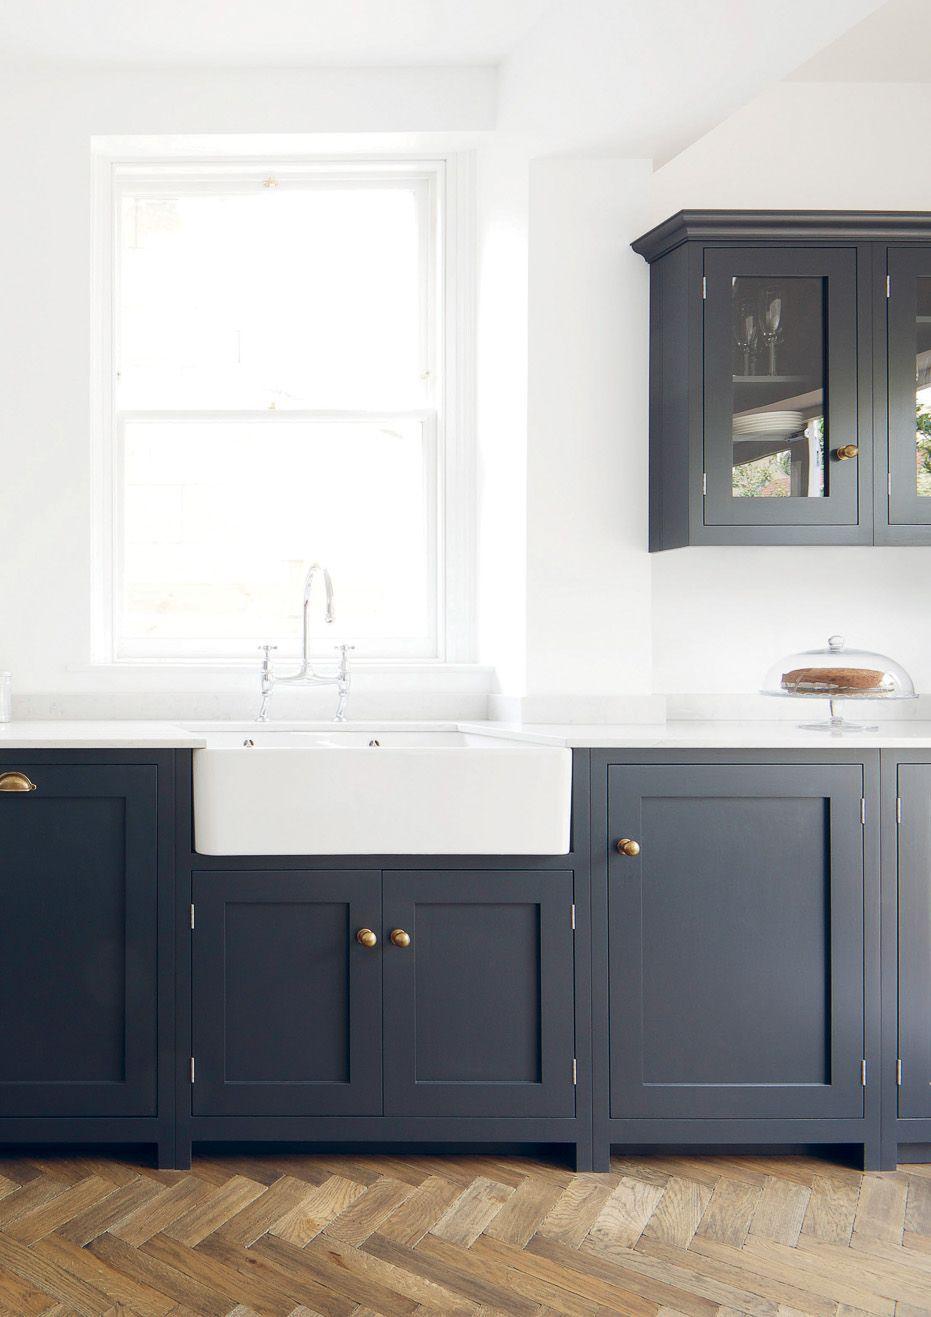 Pin de David Wheaton en Havering Cottage | Pinterest | Cocinas ...